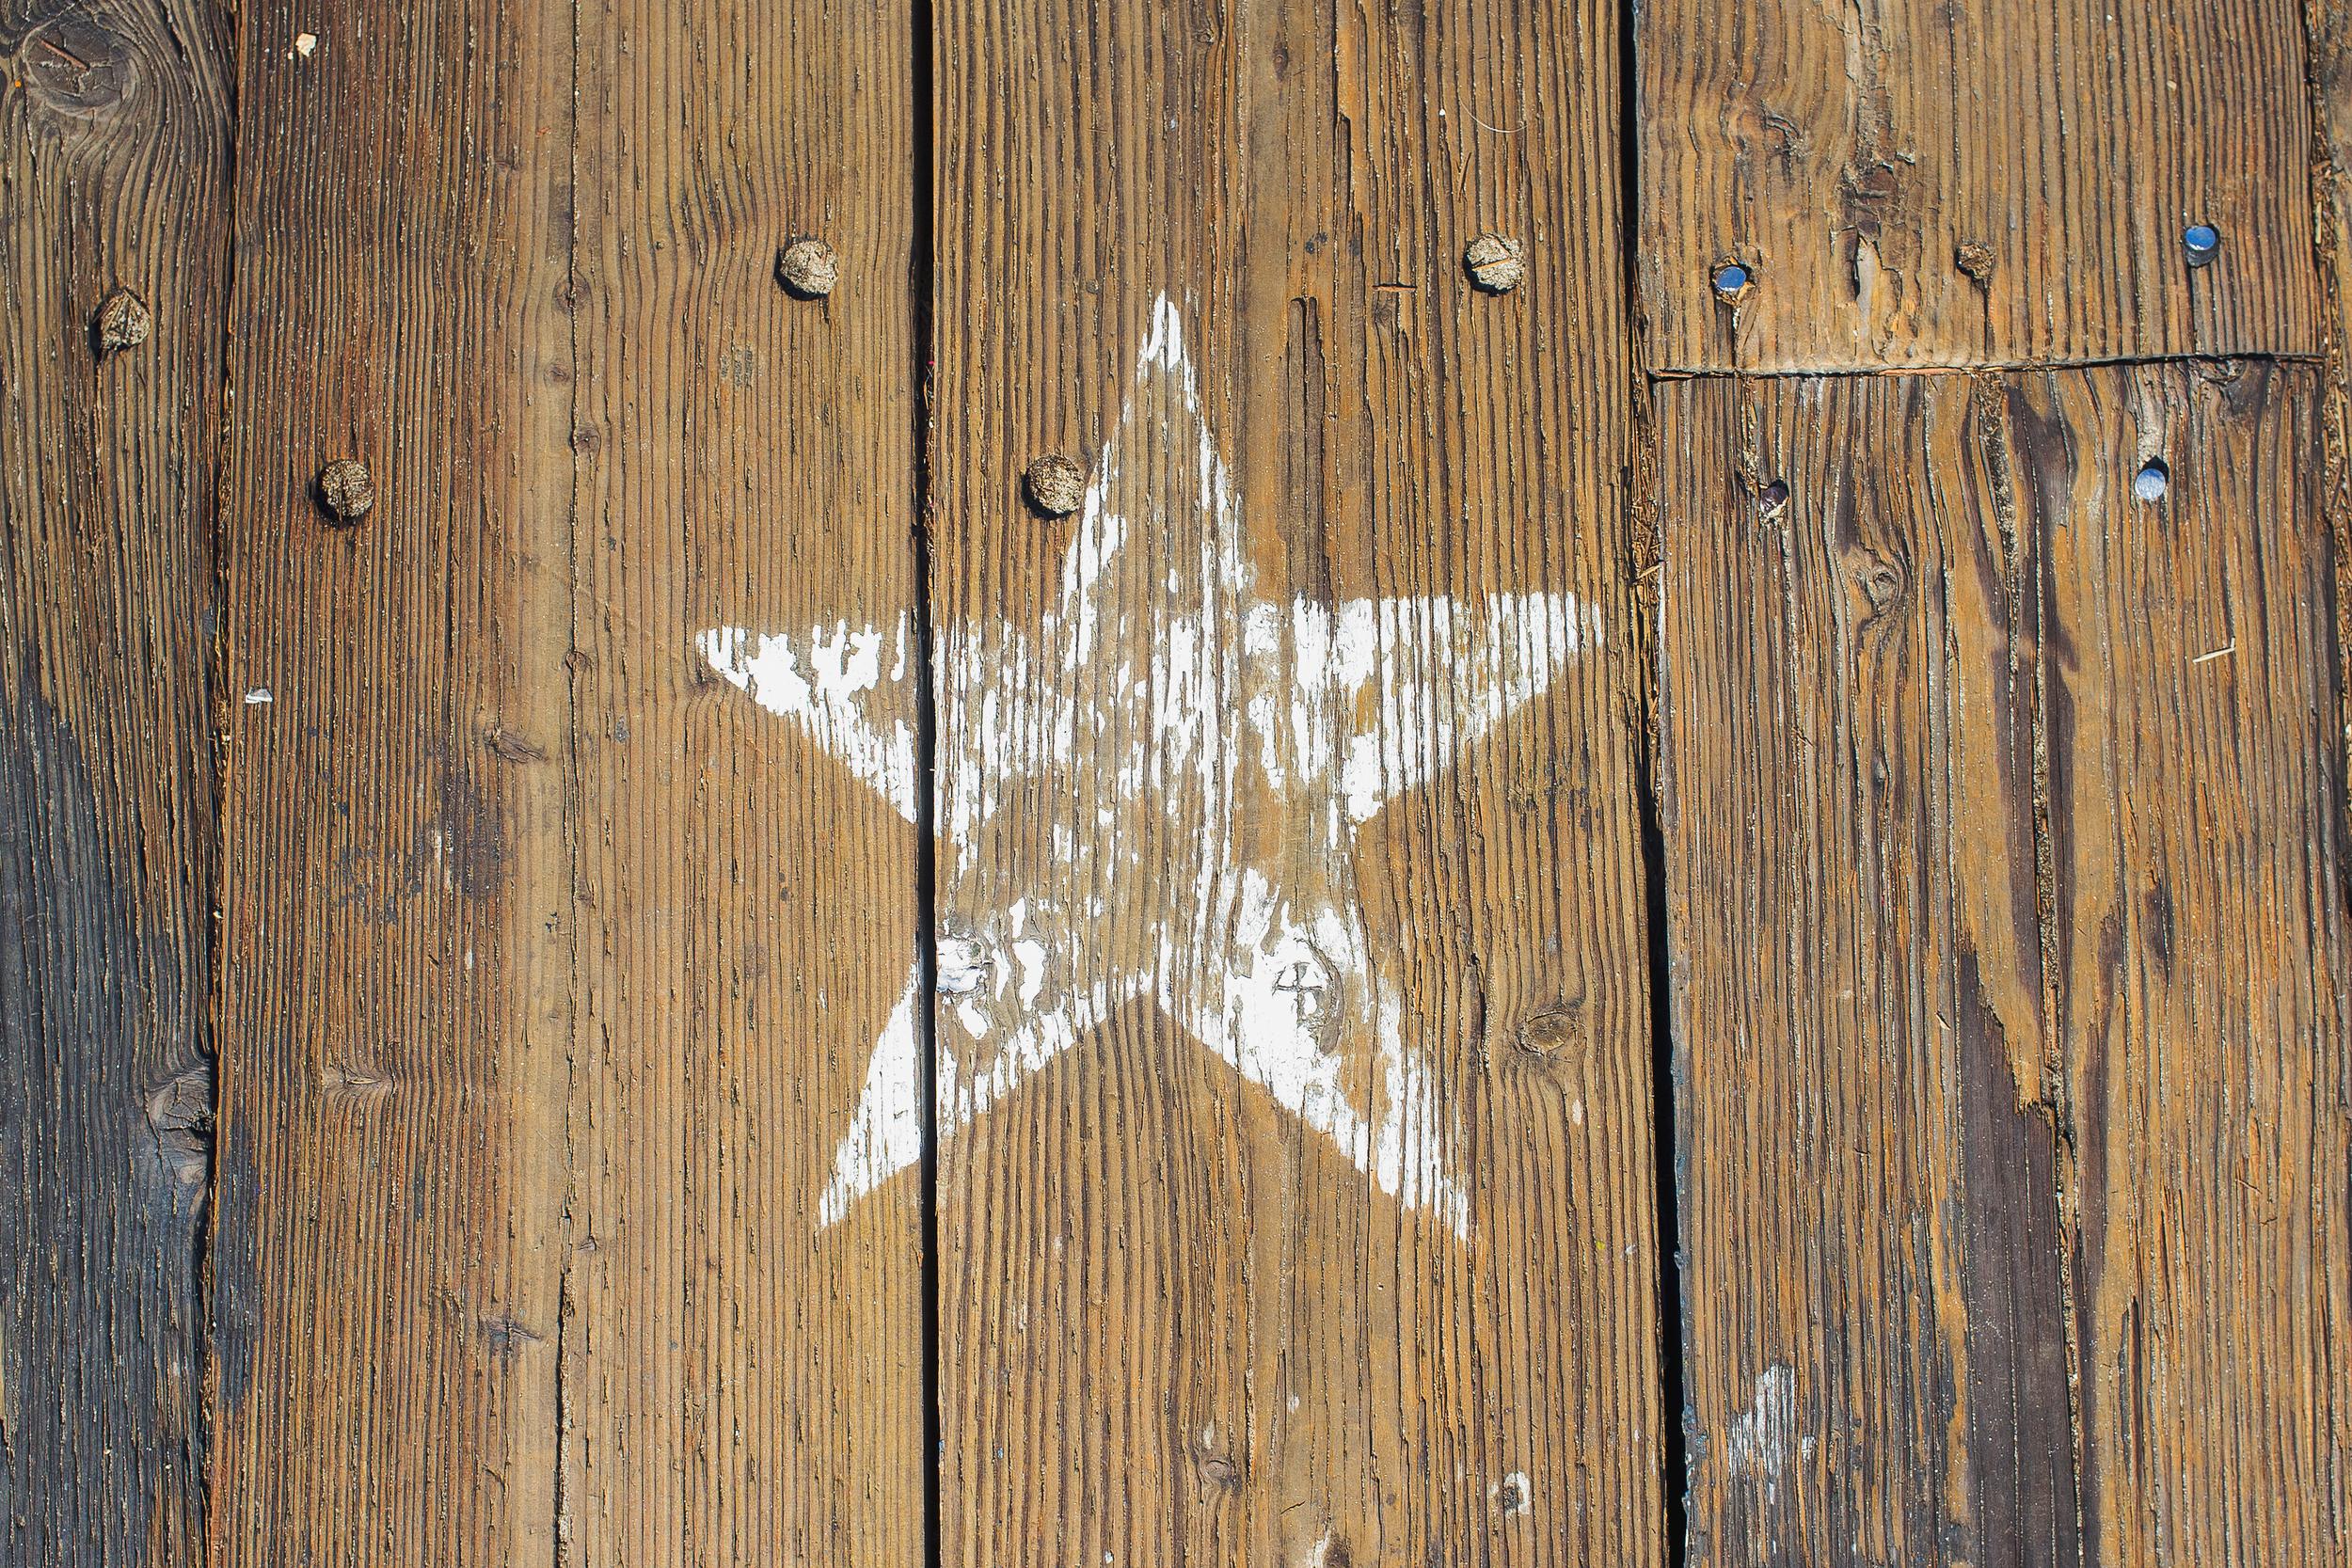 Venice Boardwalk Star.jpg